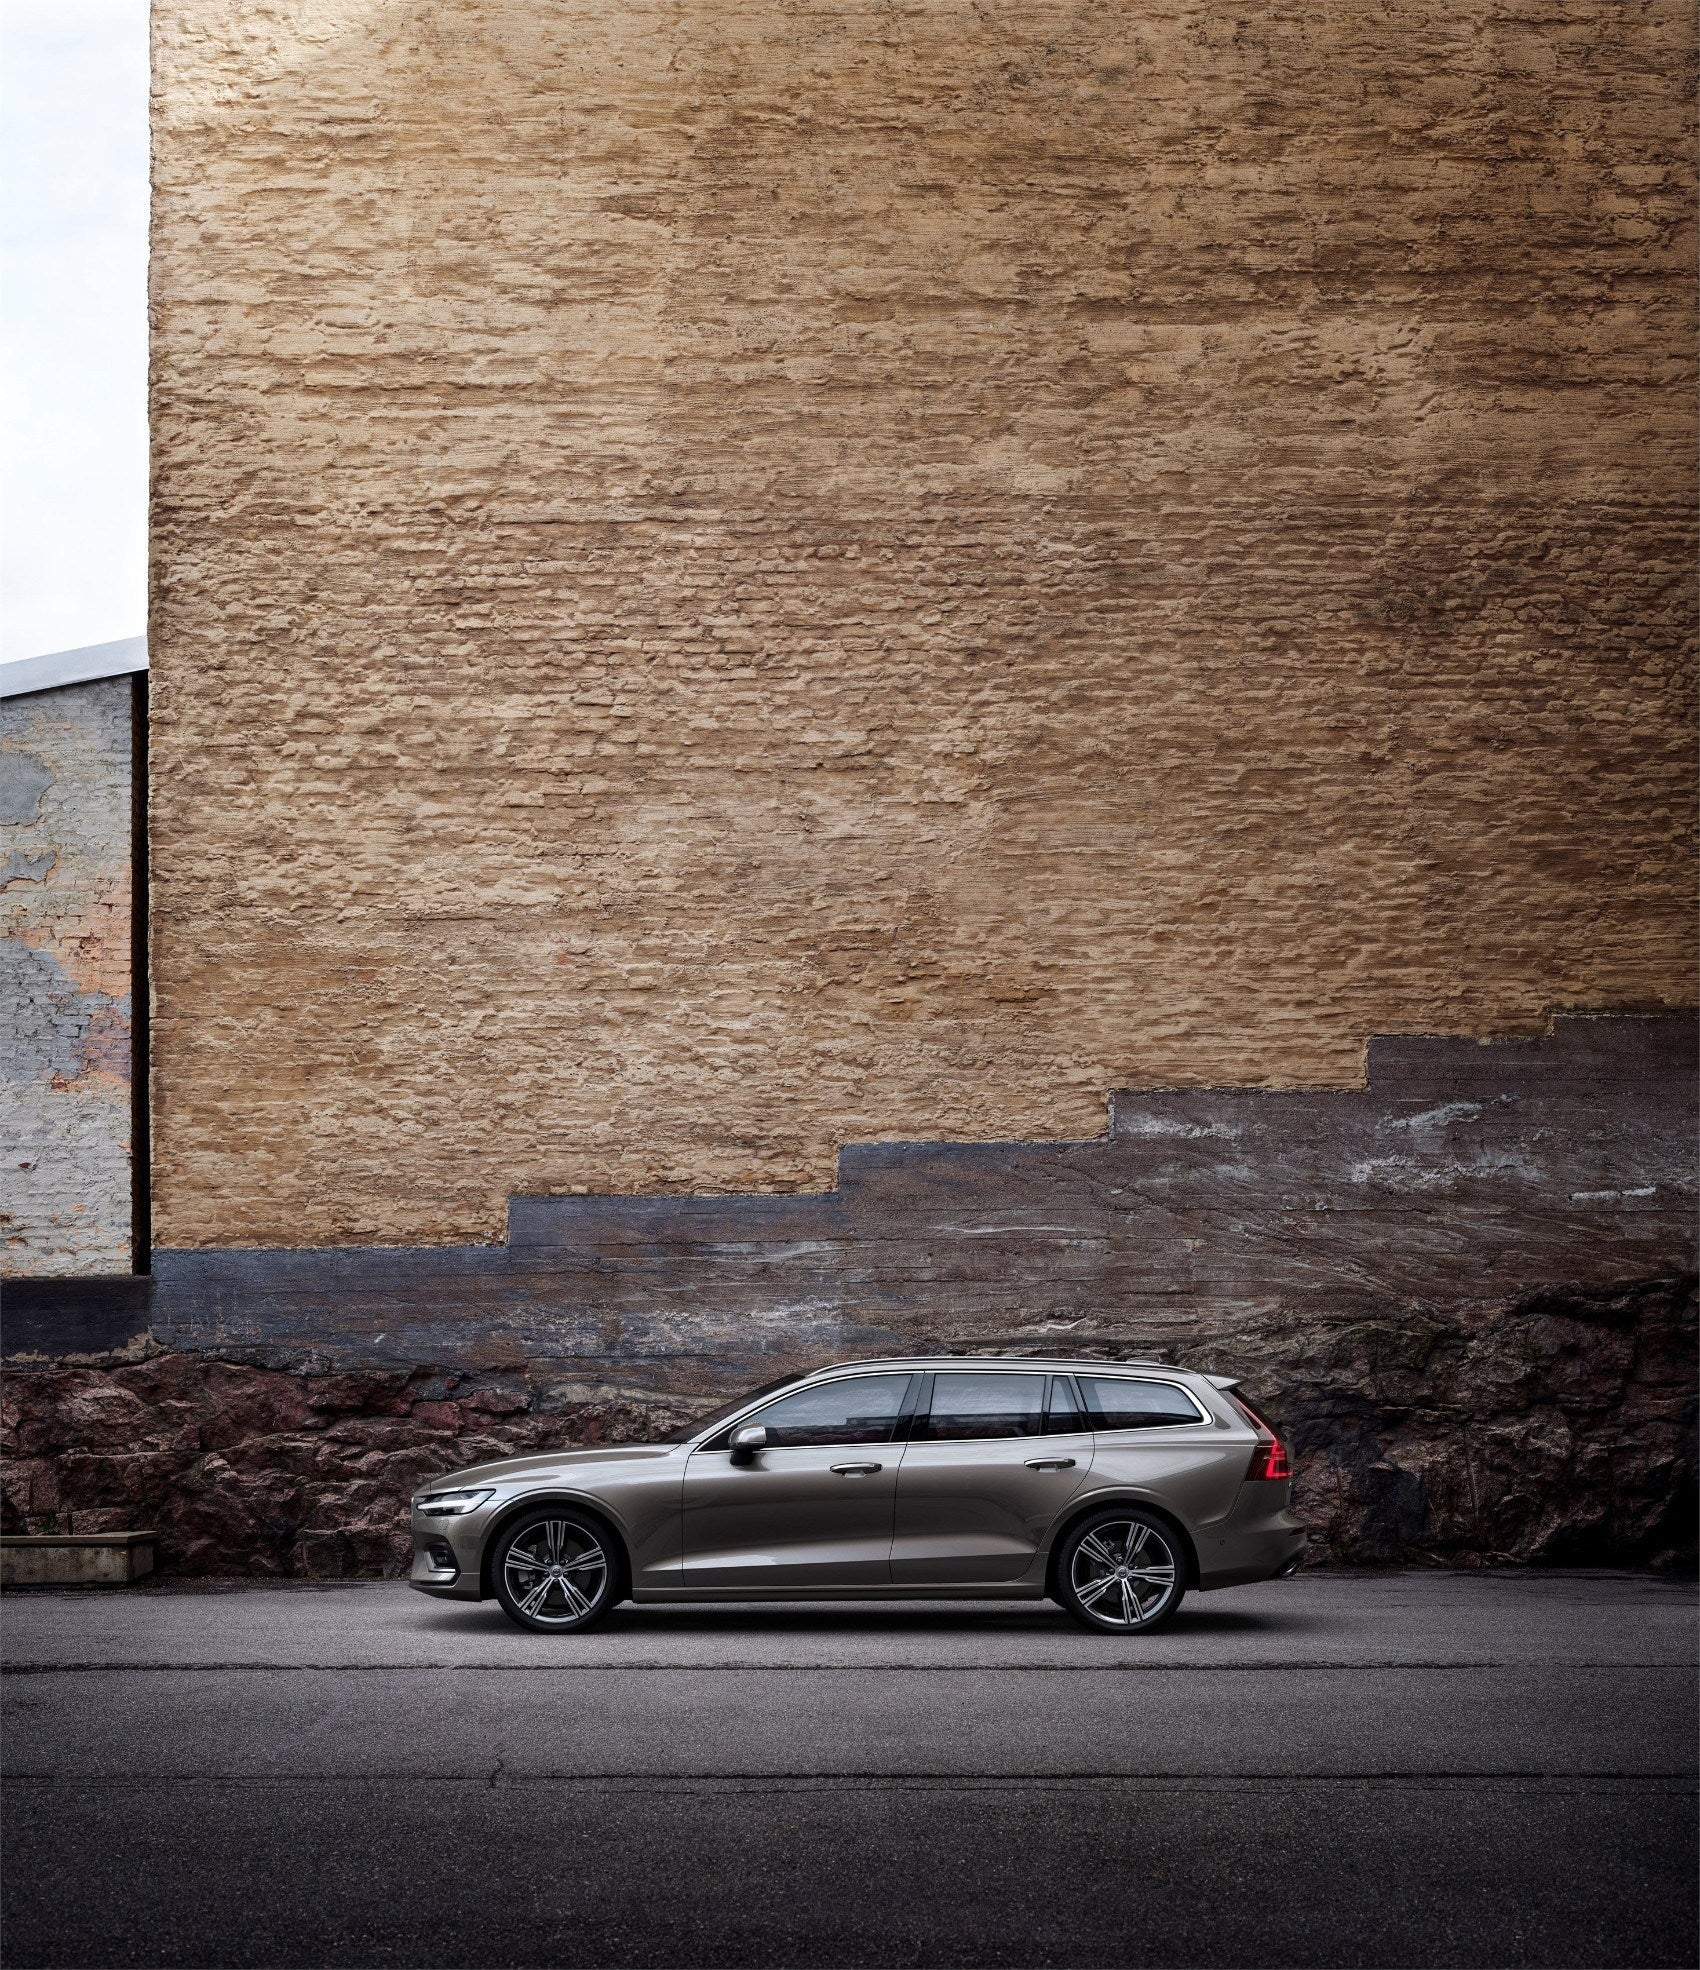 2019 Volvo V60 Review: Quick, Versatile & Safe